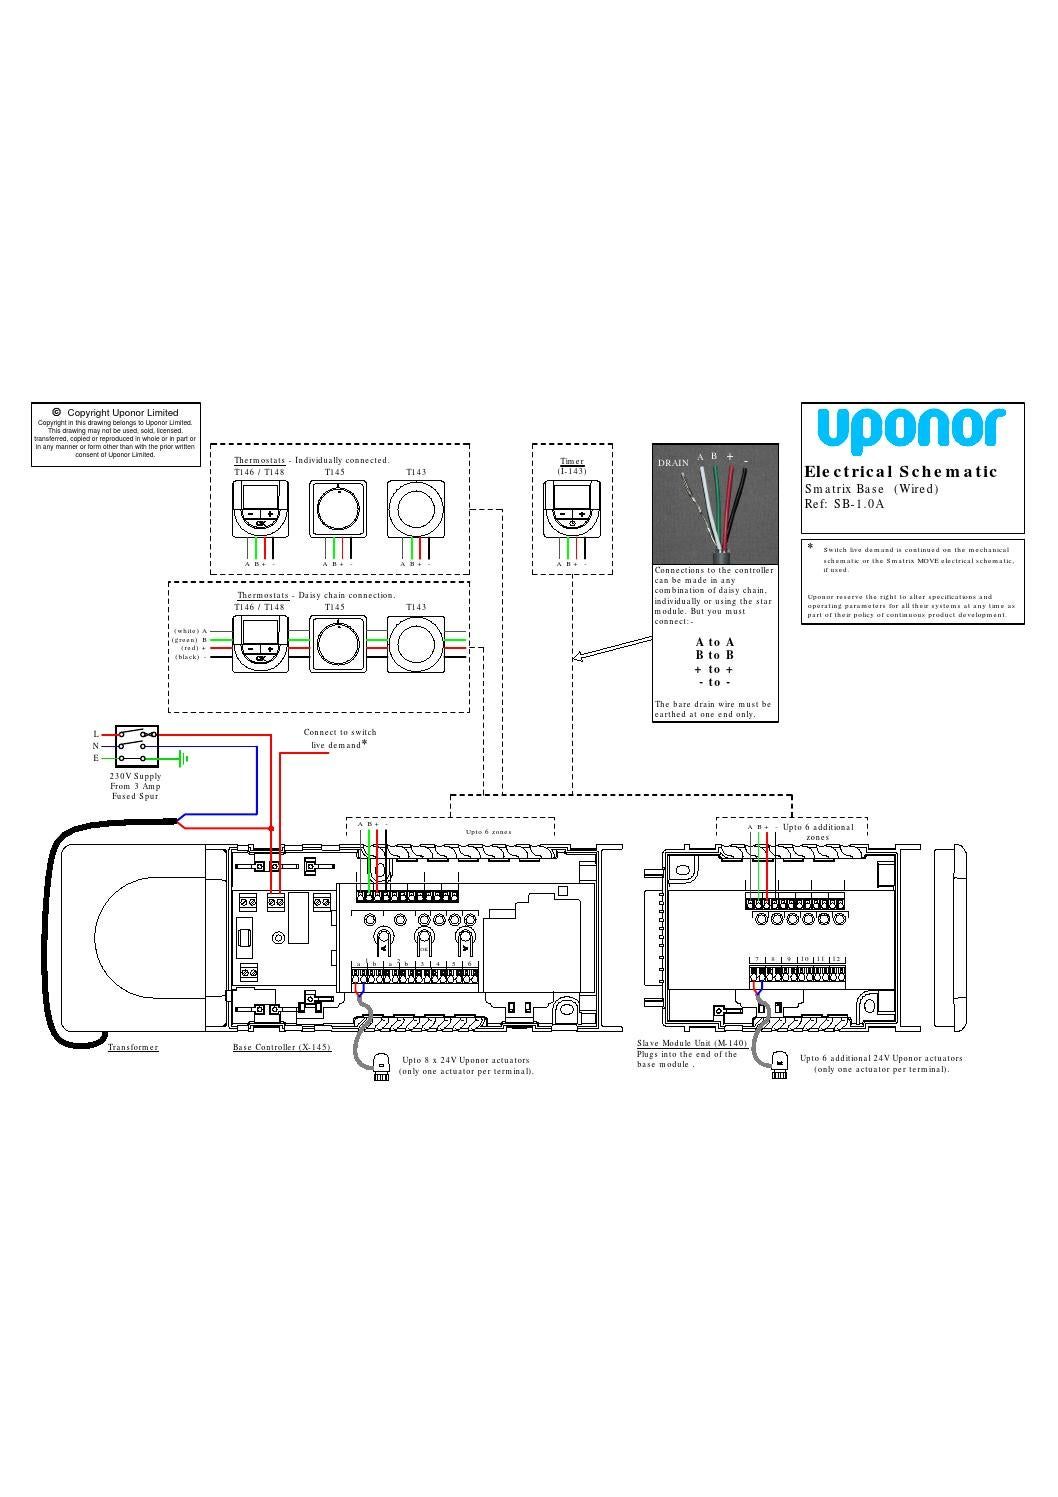 odyssey 250 atv wiring diagram wiring diagram